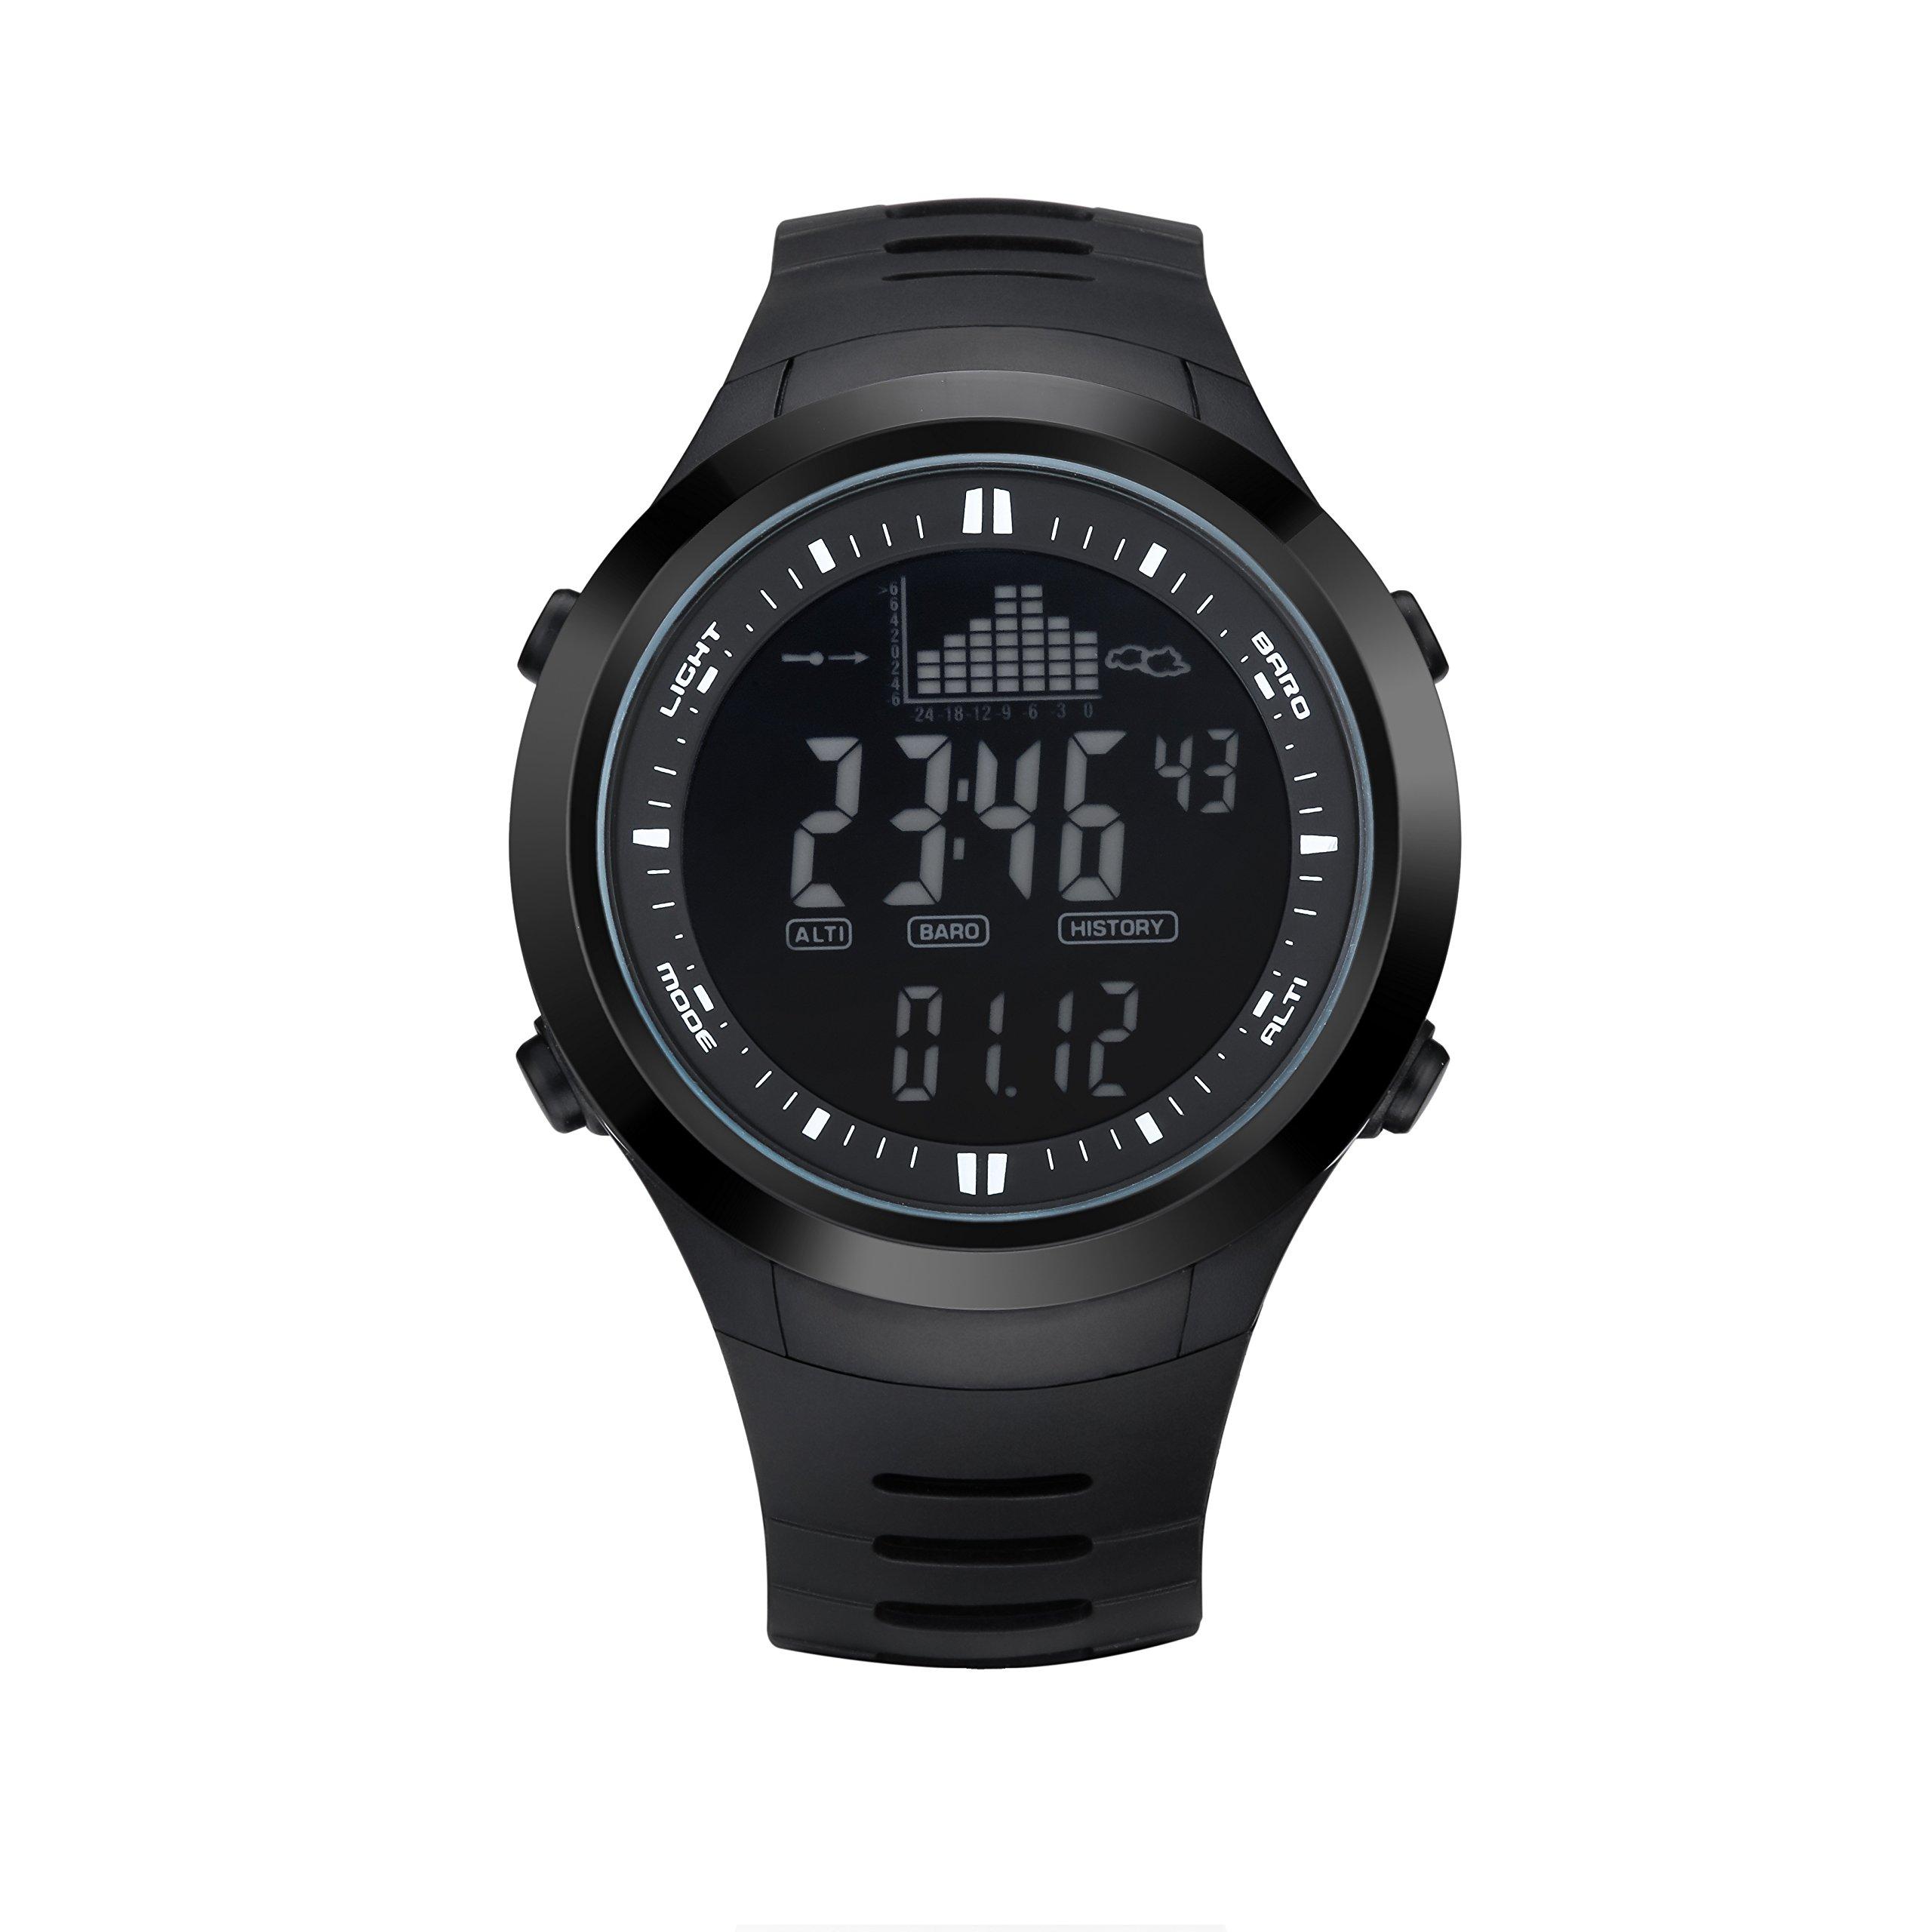 Morjava SPV-709 Military Watche 30M waterproof Men Clock Barometer Waterproof Thermometer Altimeter Military Sports Digital Watch Men's Watch -Black